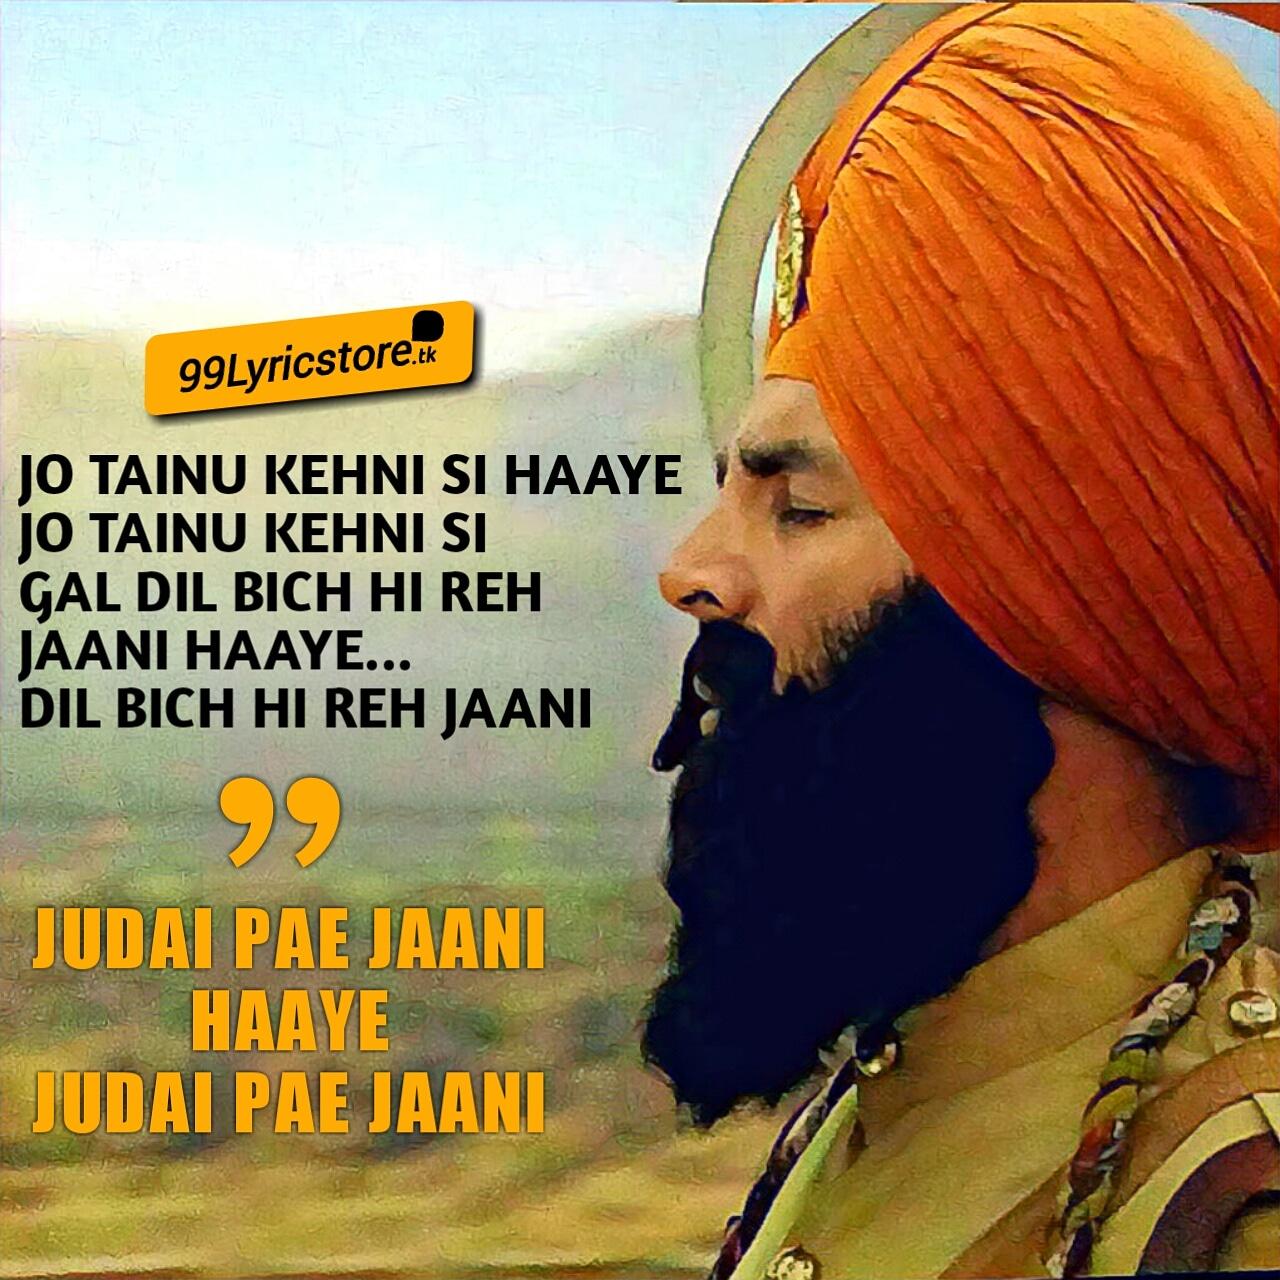 Judai pae Jaani punjabi song Lyrics from movie Kesari